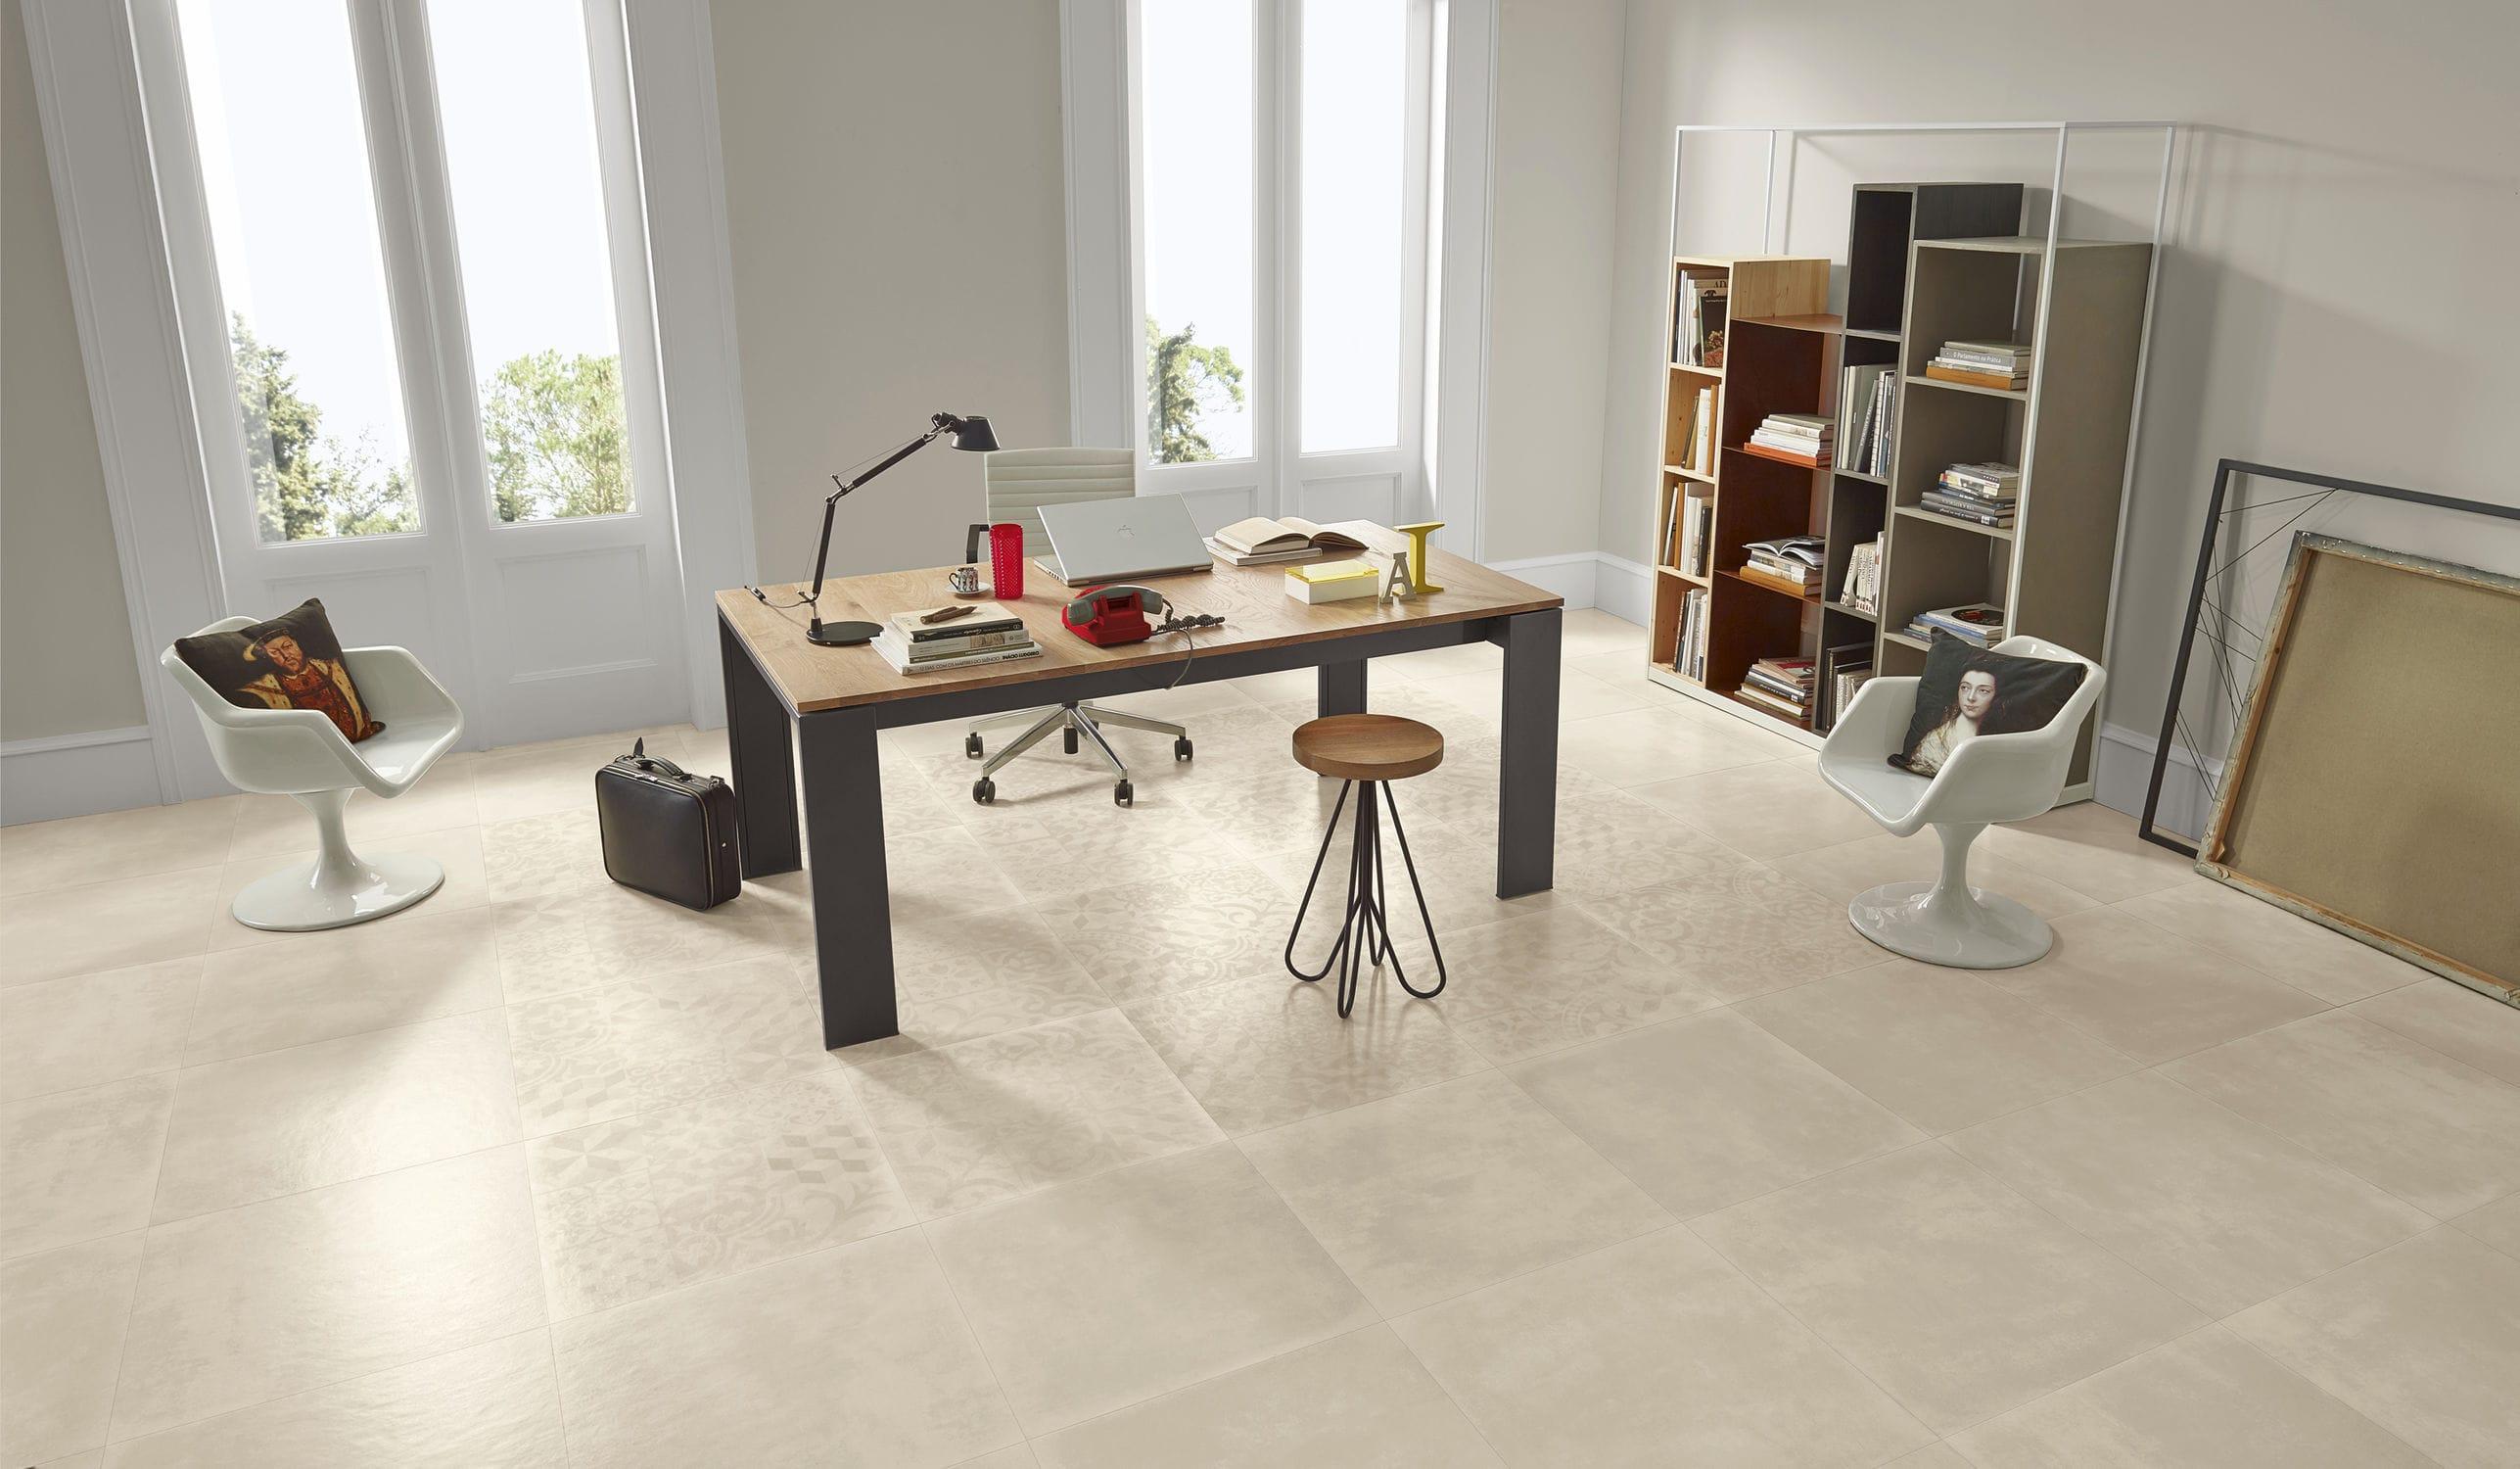 Indoor Tile Floor Porcelain Stoneware Satin Ground Love